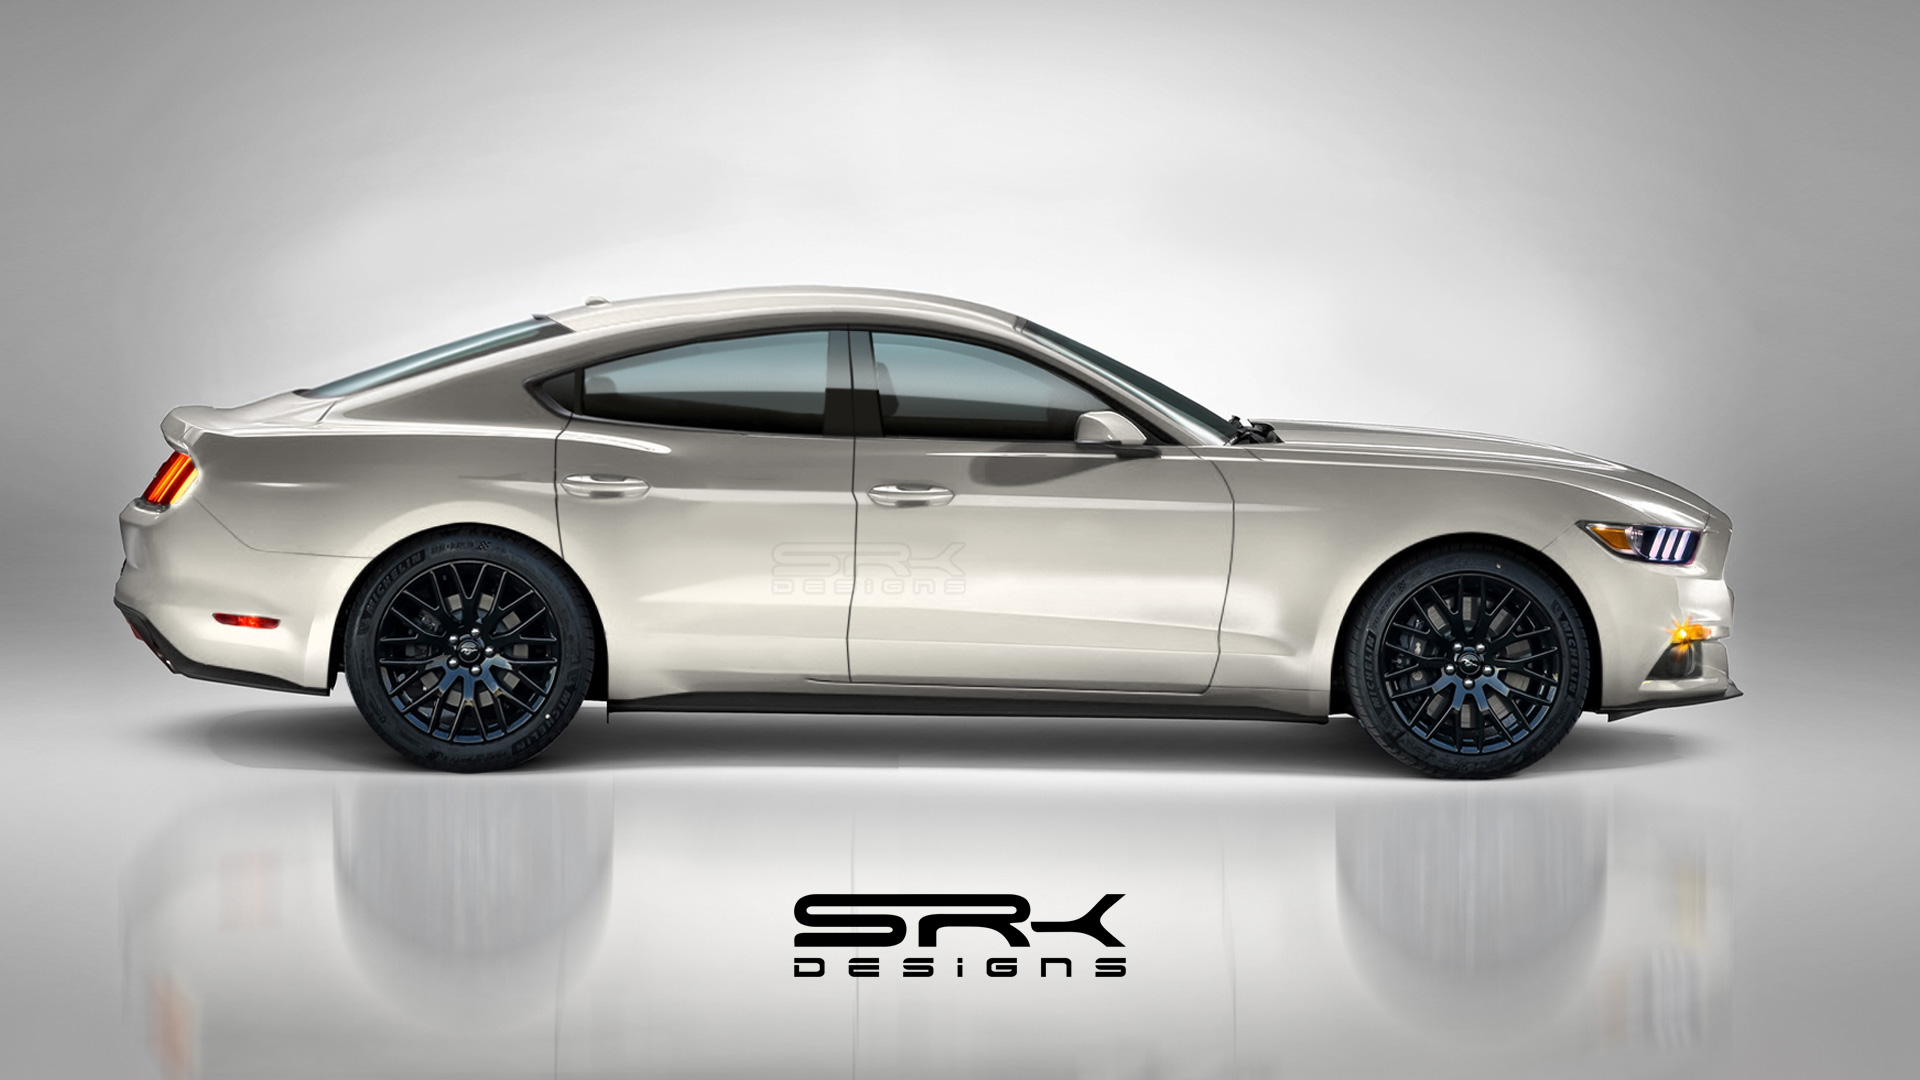 Ford-Mustang-4-door-Sedan